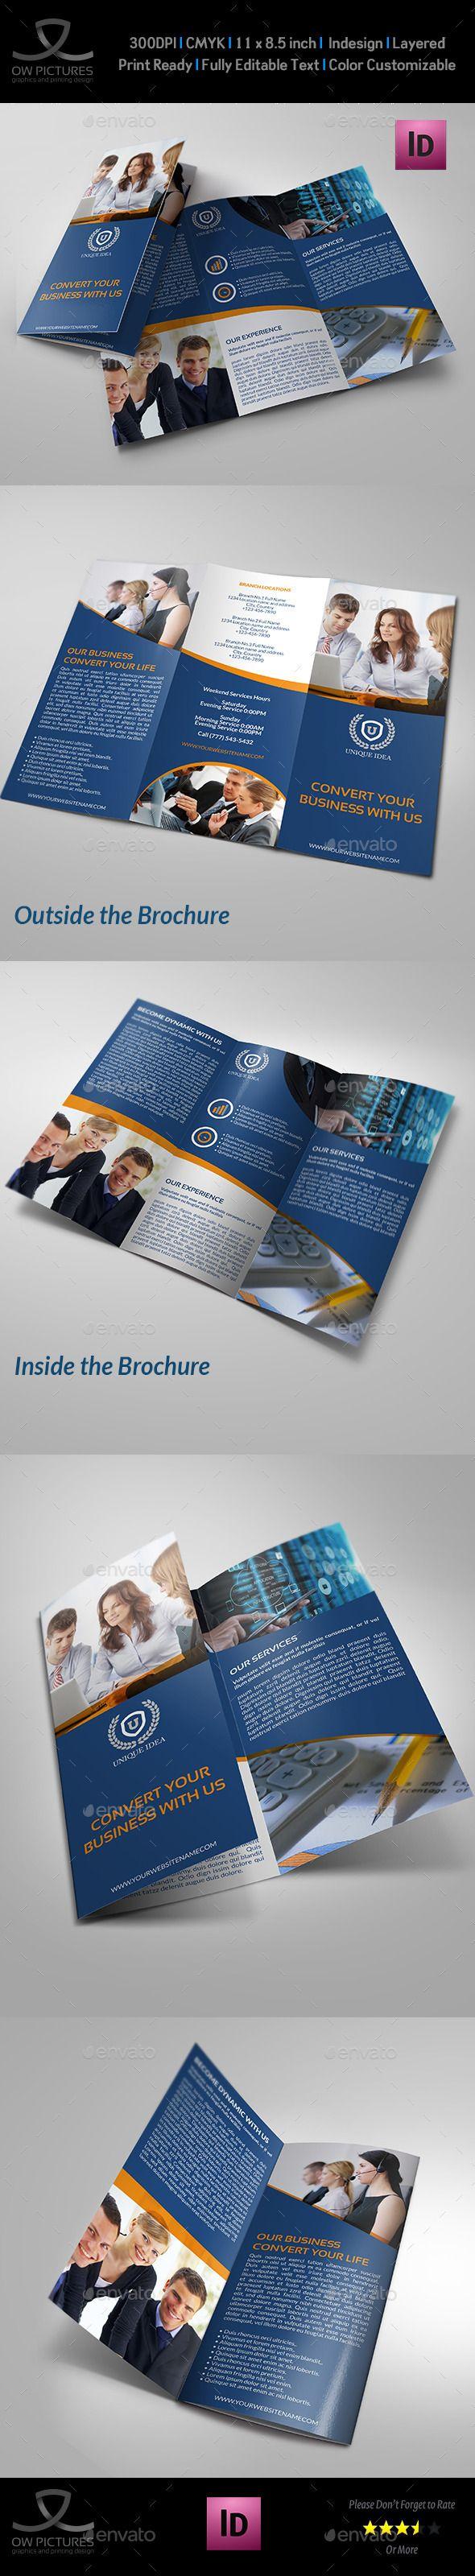 79 best Brochure Tri-Fold images on Pinterest   Tri fold brochure ...